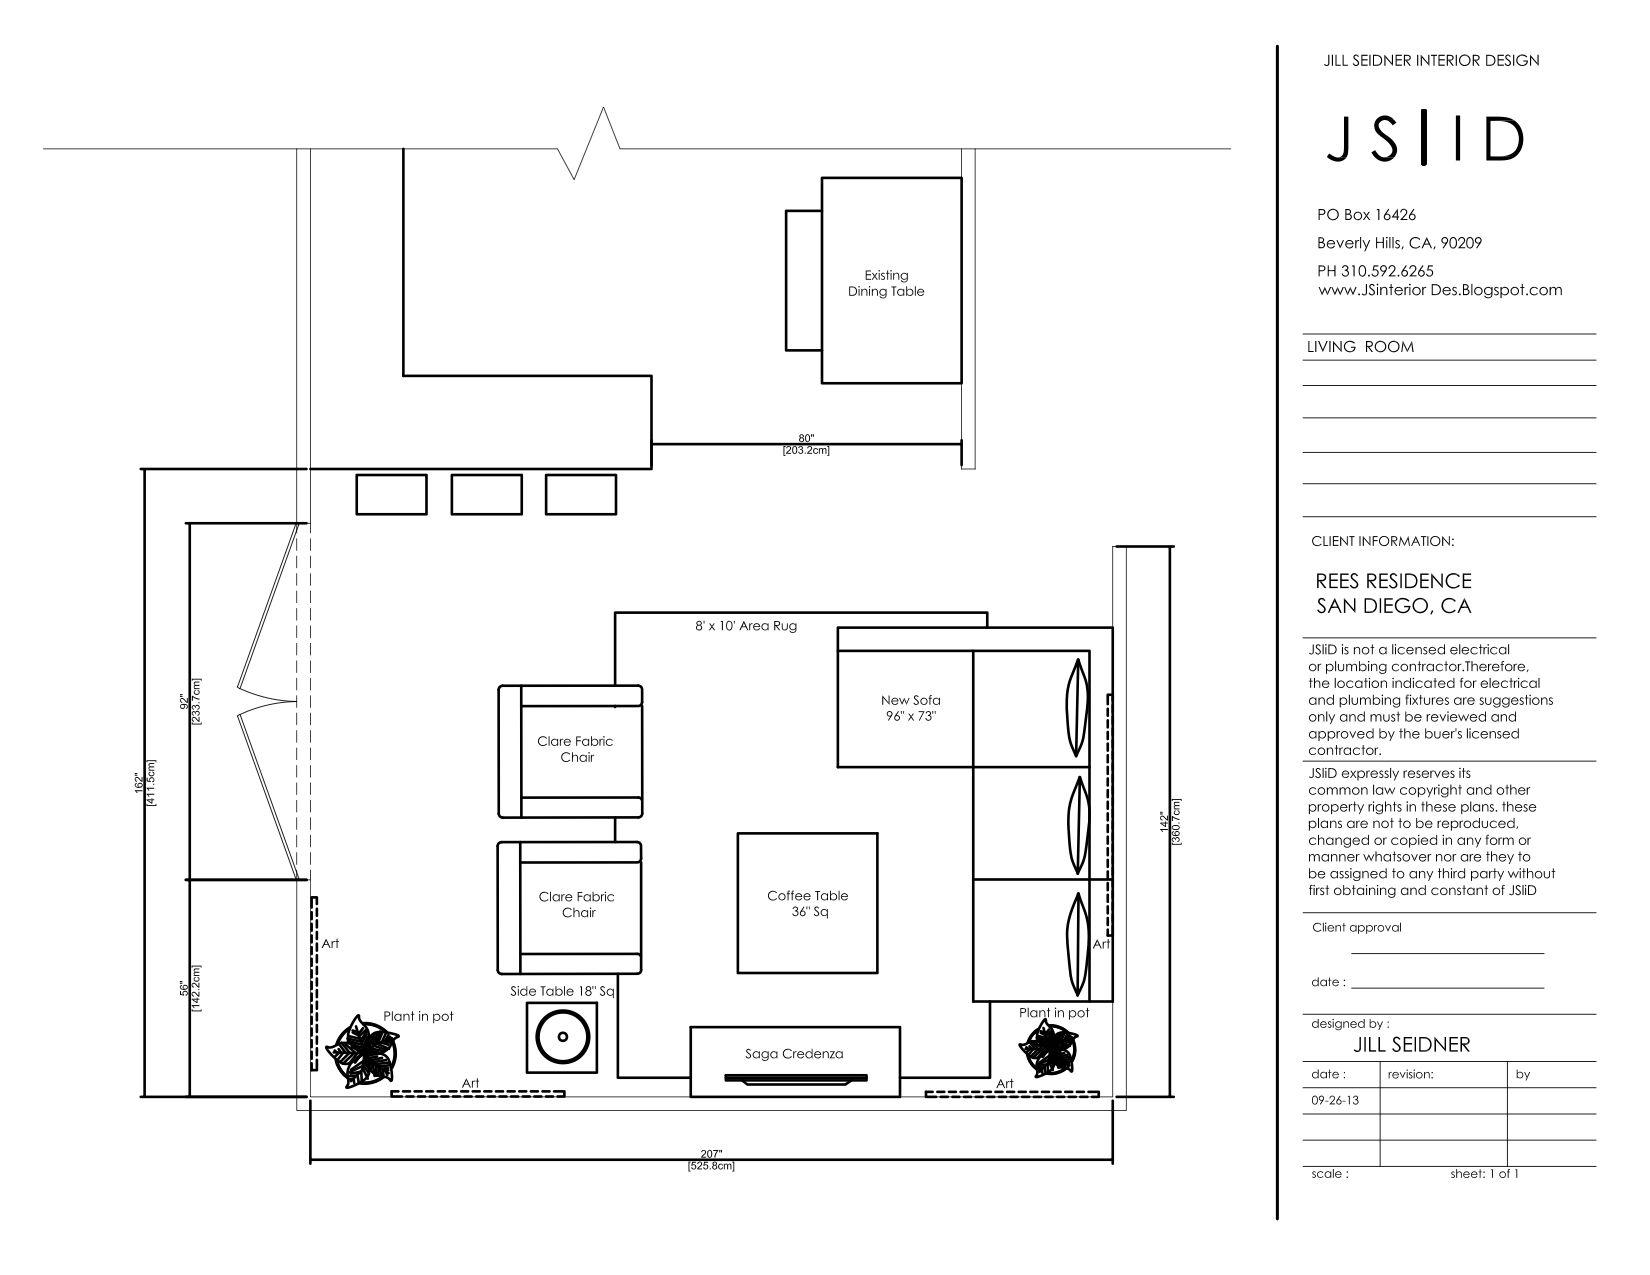 San Diego, CA Residence Living Room Furniture Floor Plan